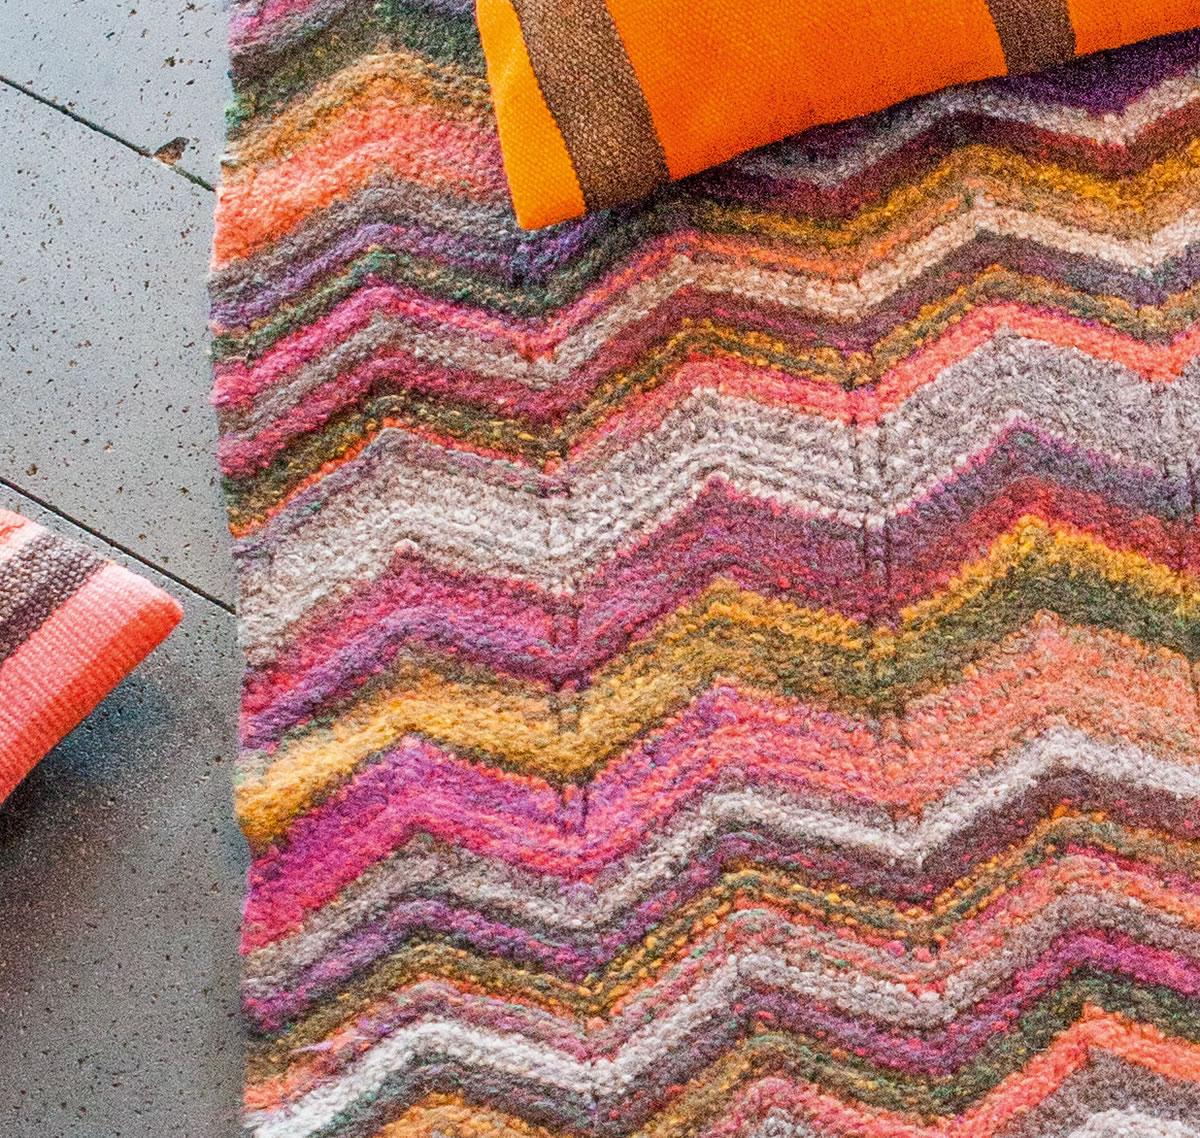 lana grossa gefilzter teppich im zackenmuster feltro spectra filati handstrick no 59 home. Black Bedroom Furniture Sets. Home Design Ideas